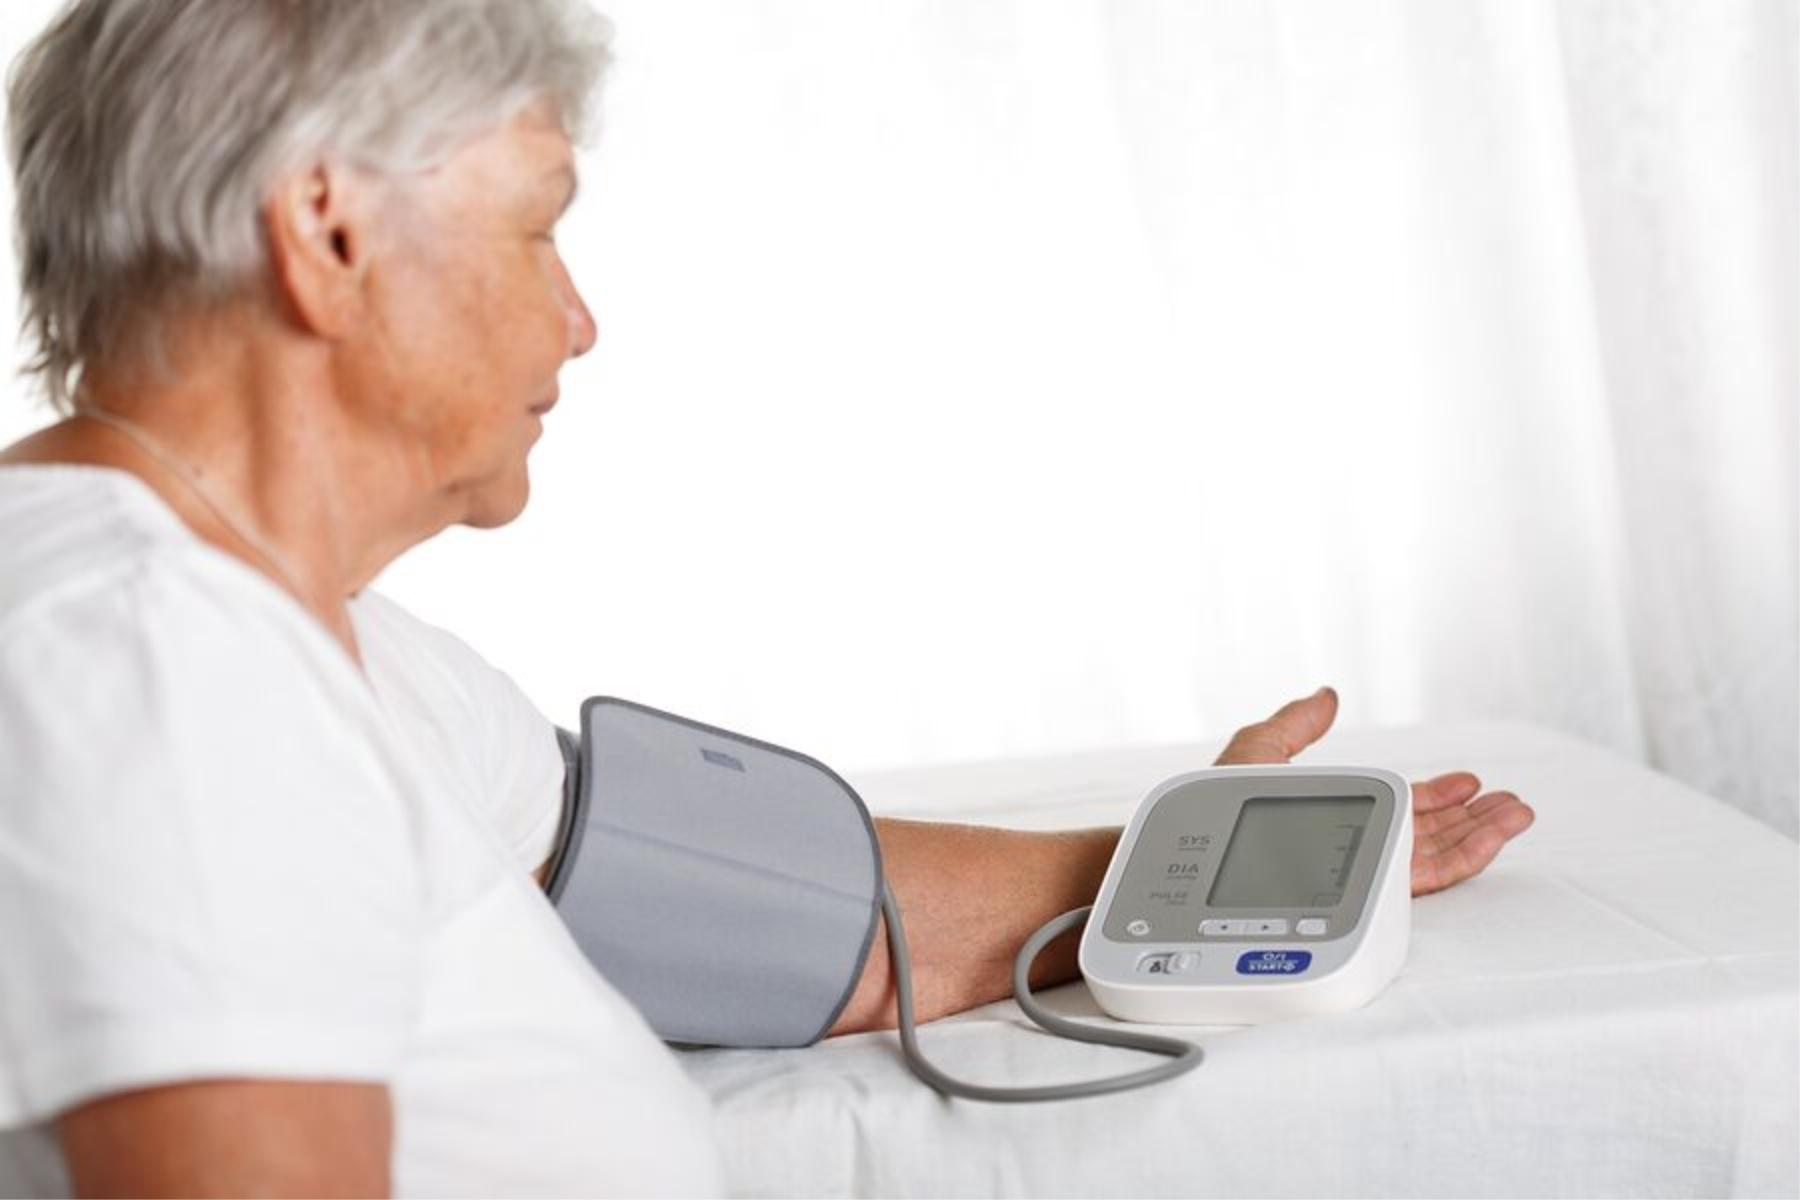 Senior Care in Tempe AZ: Home Blood Pressure Monitor